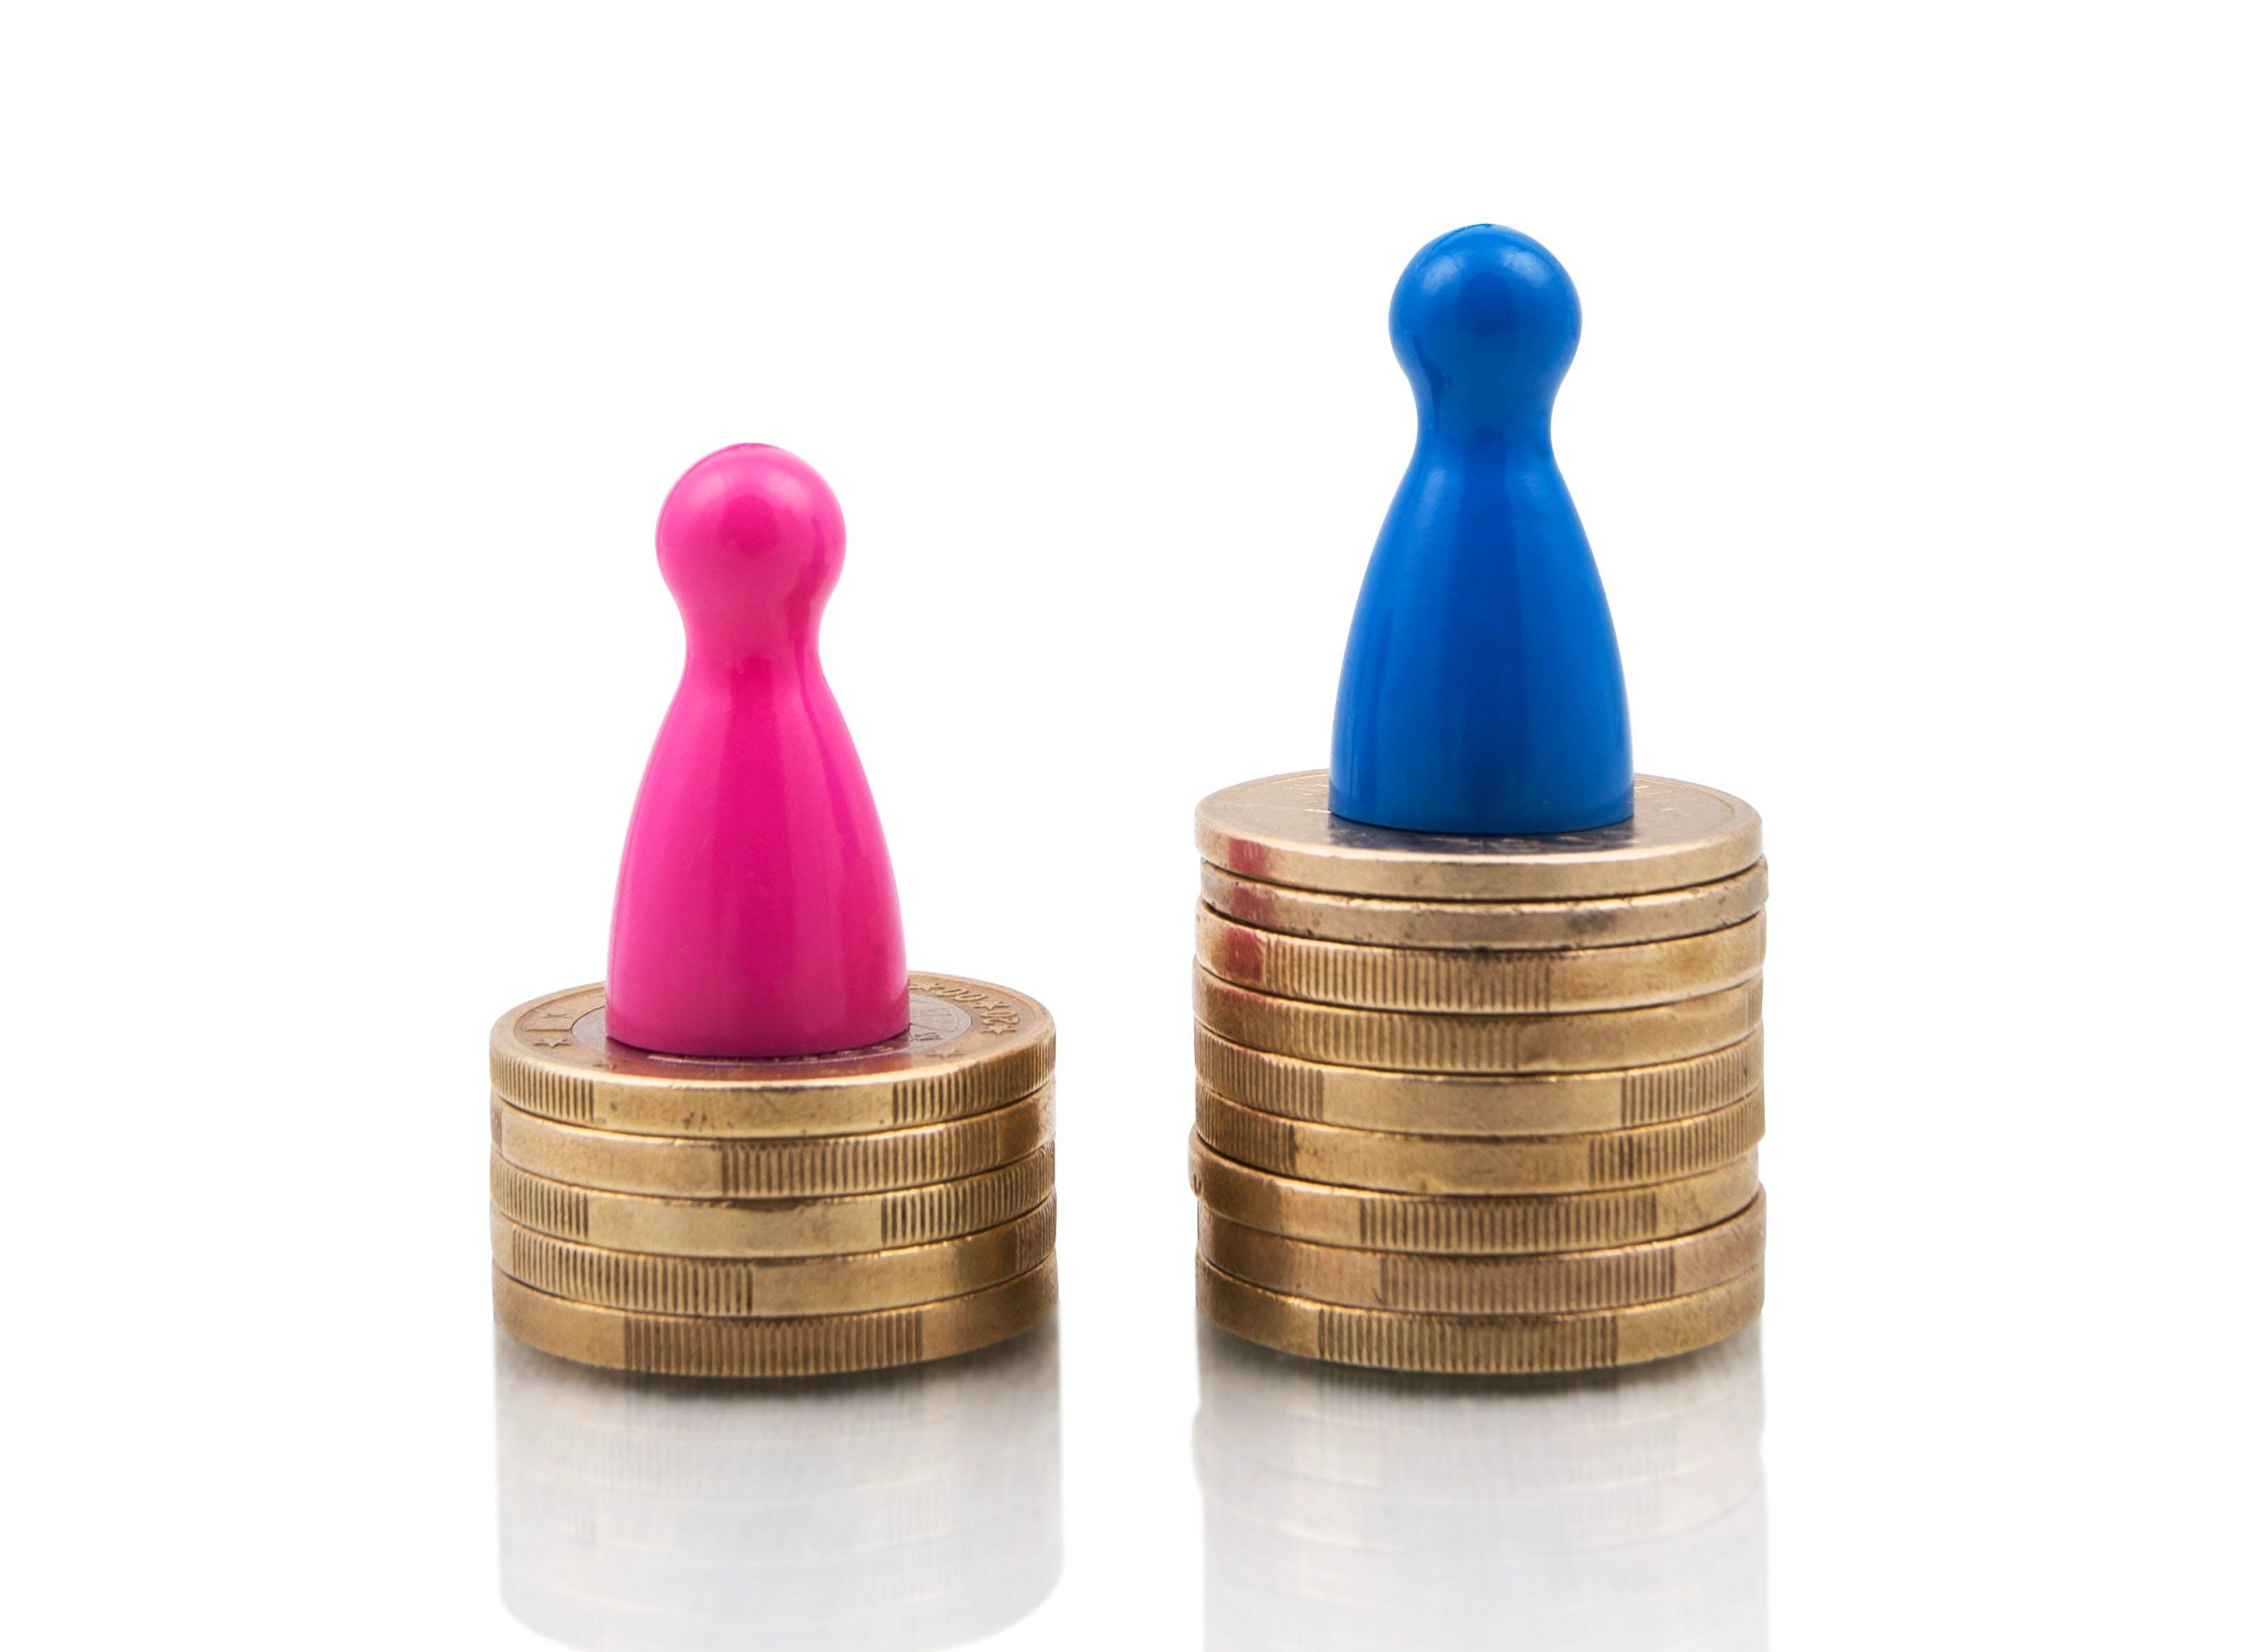 male, female, Gender pay gap